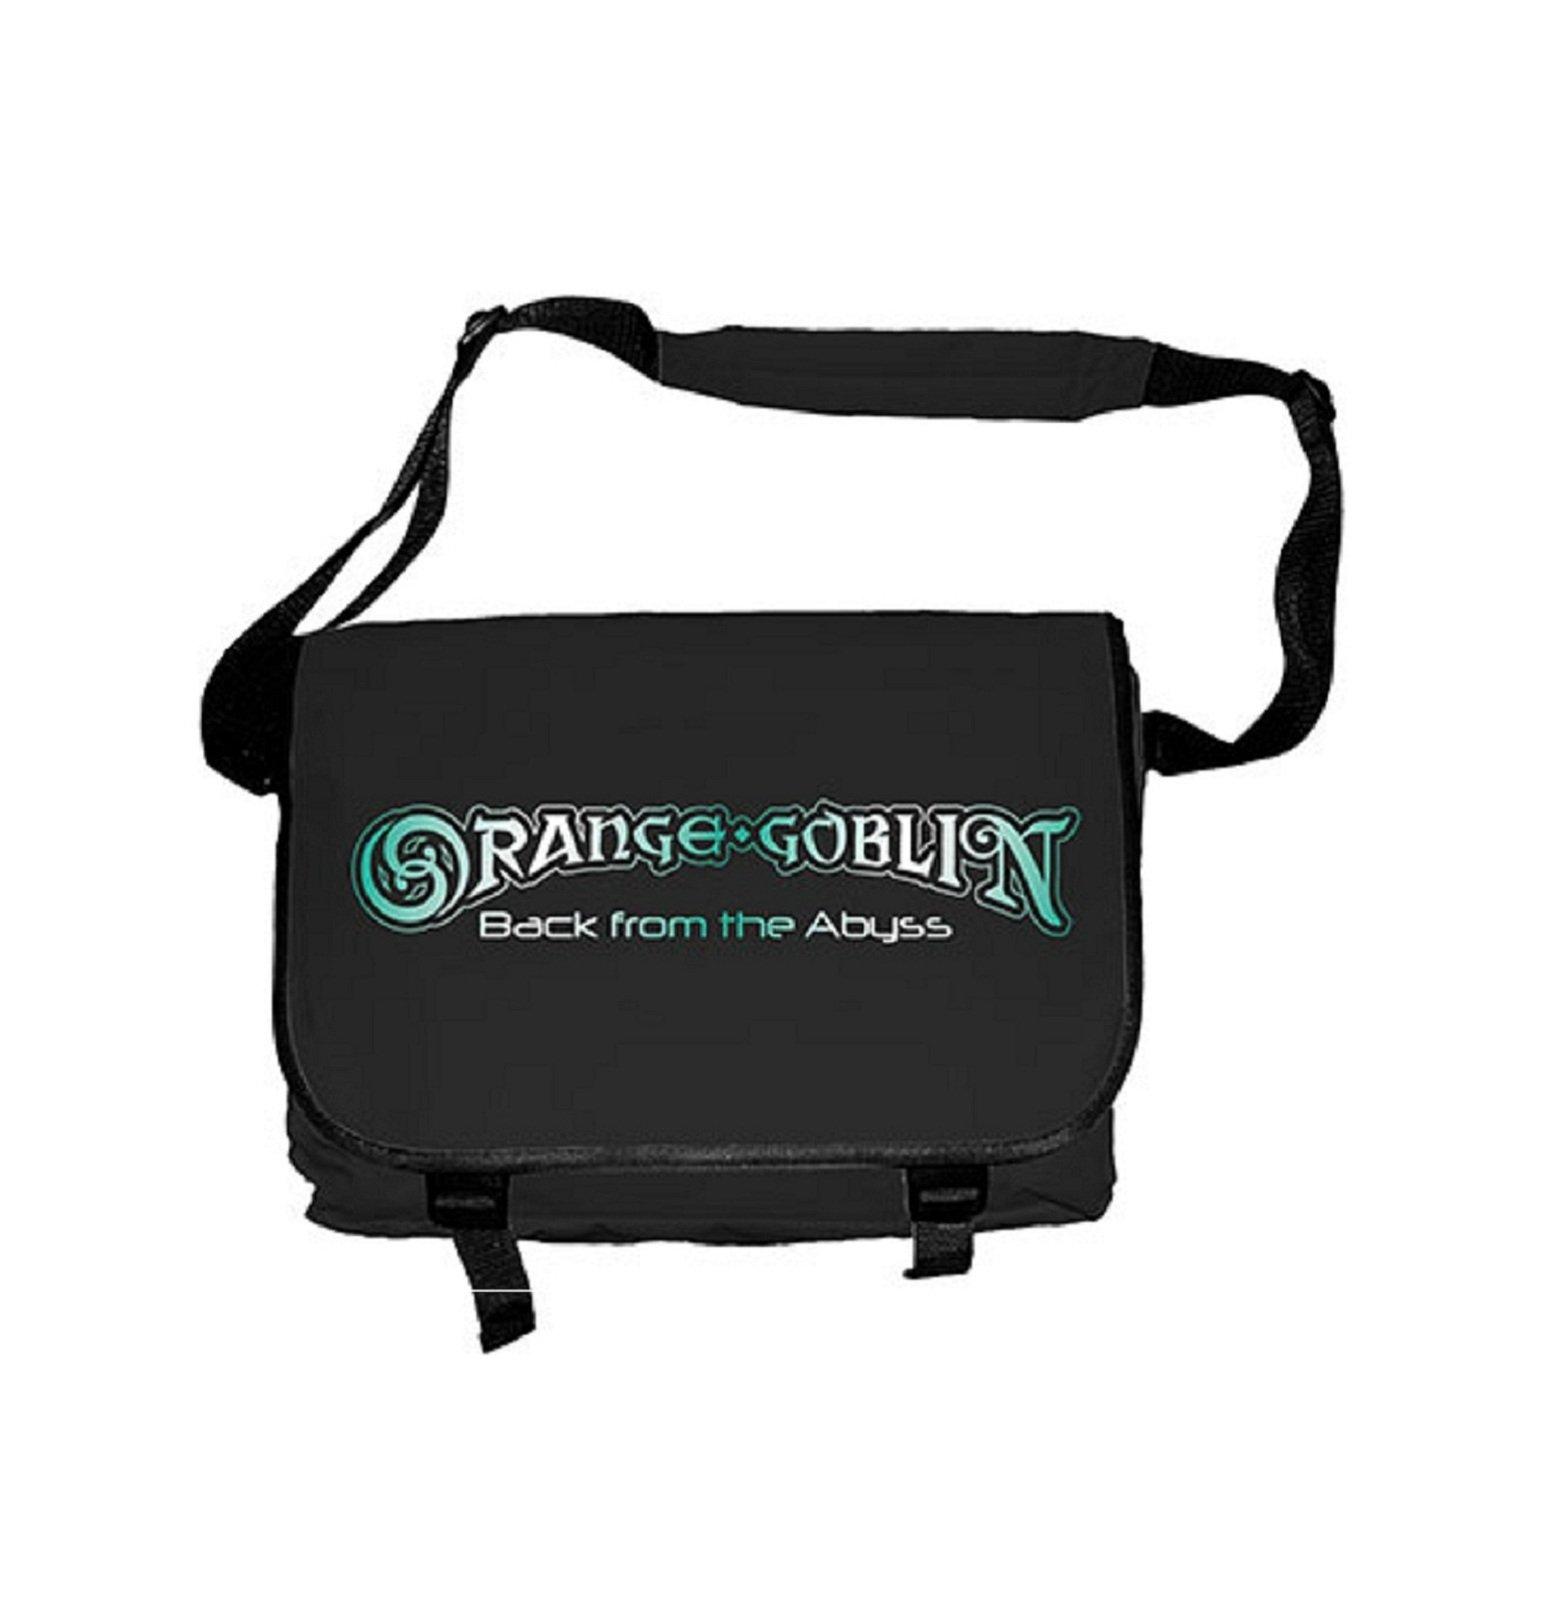 Orange Goblin Back From The Abyss Official Black Messenger Bag